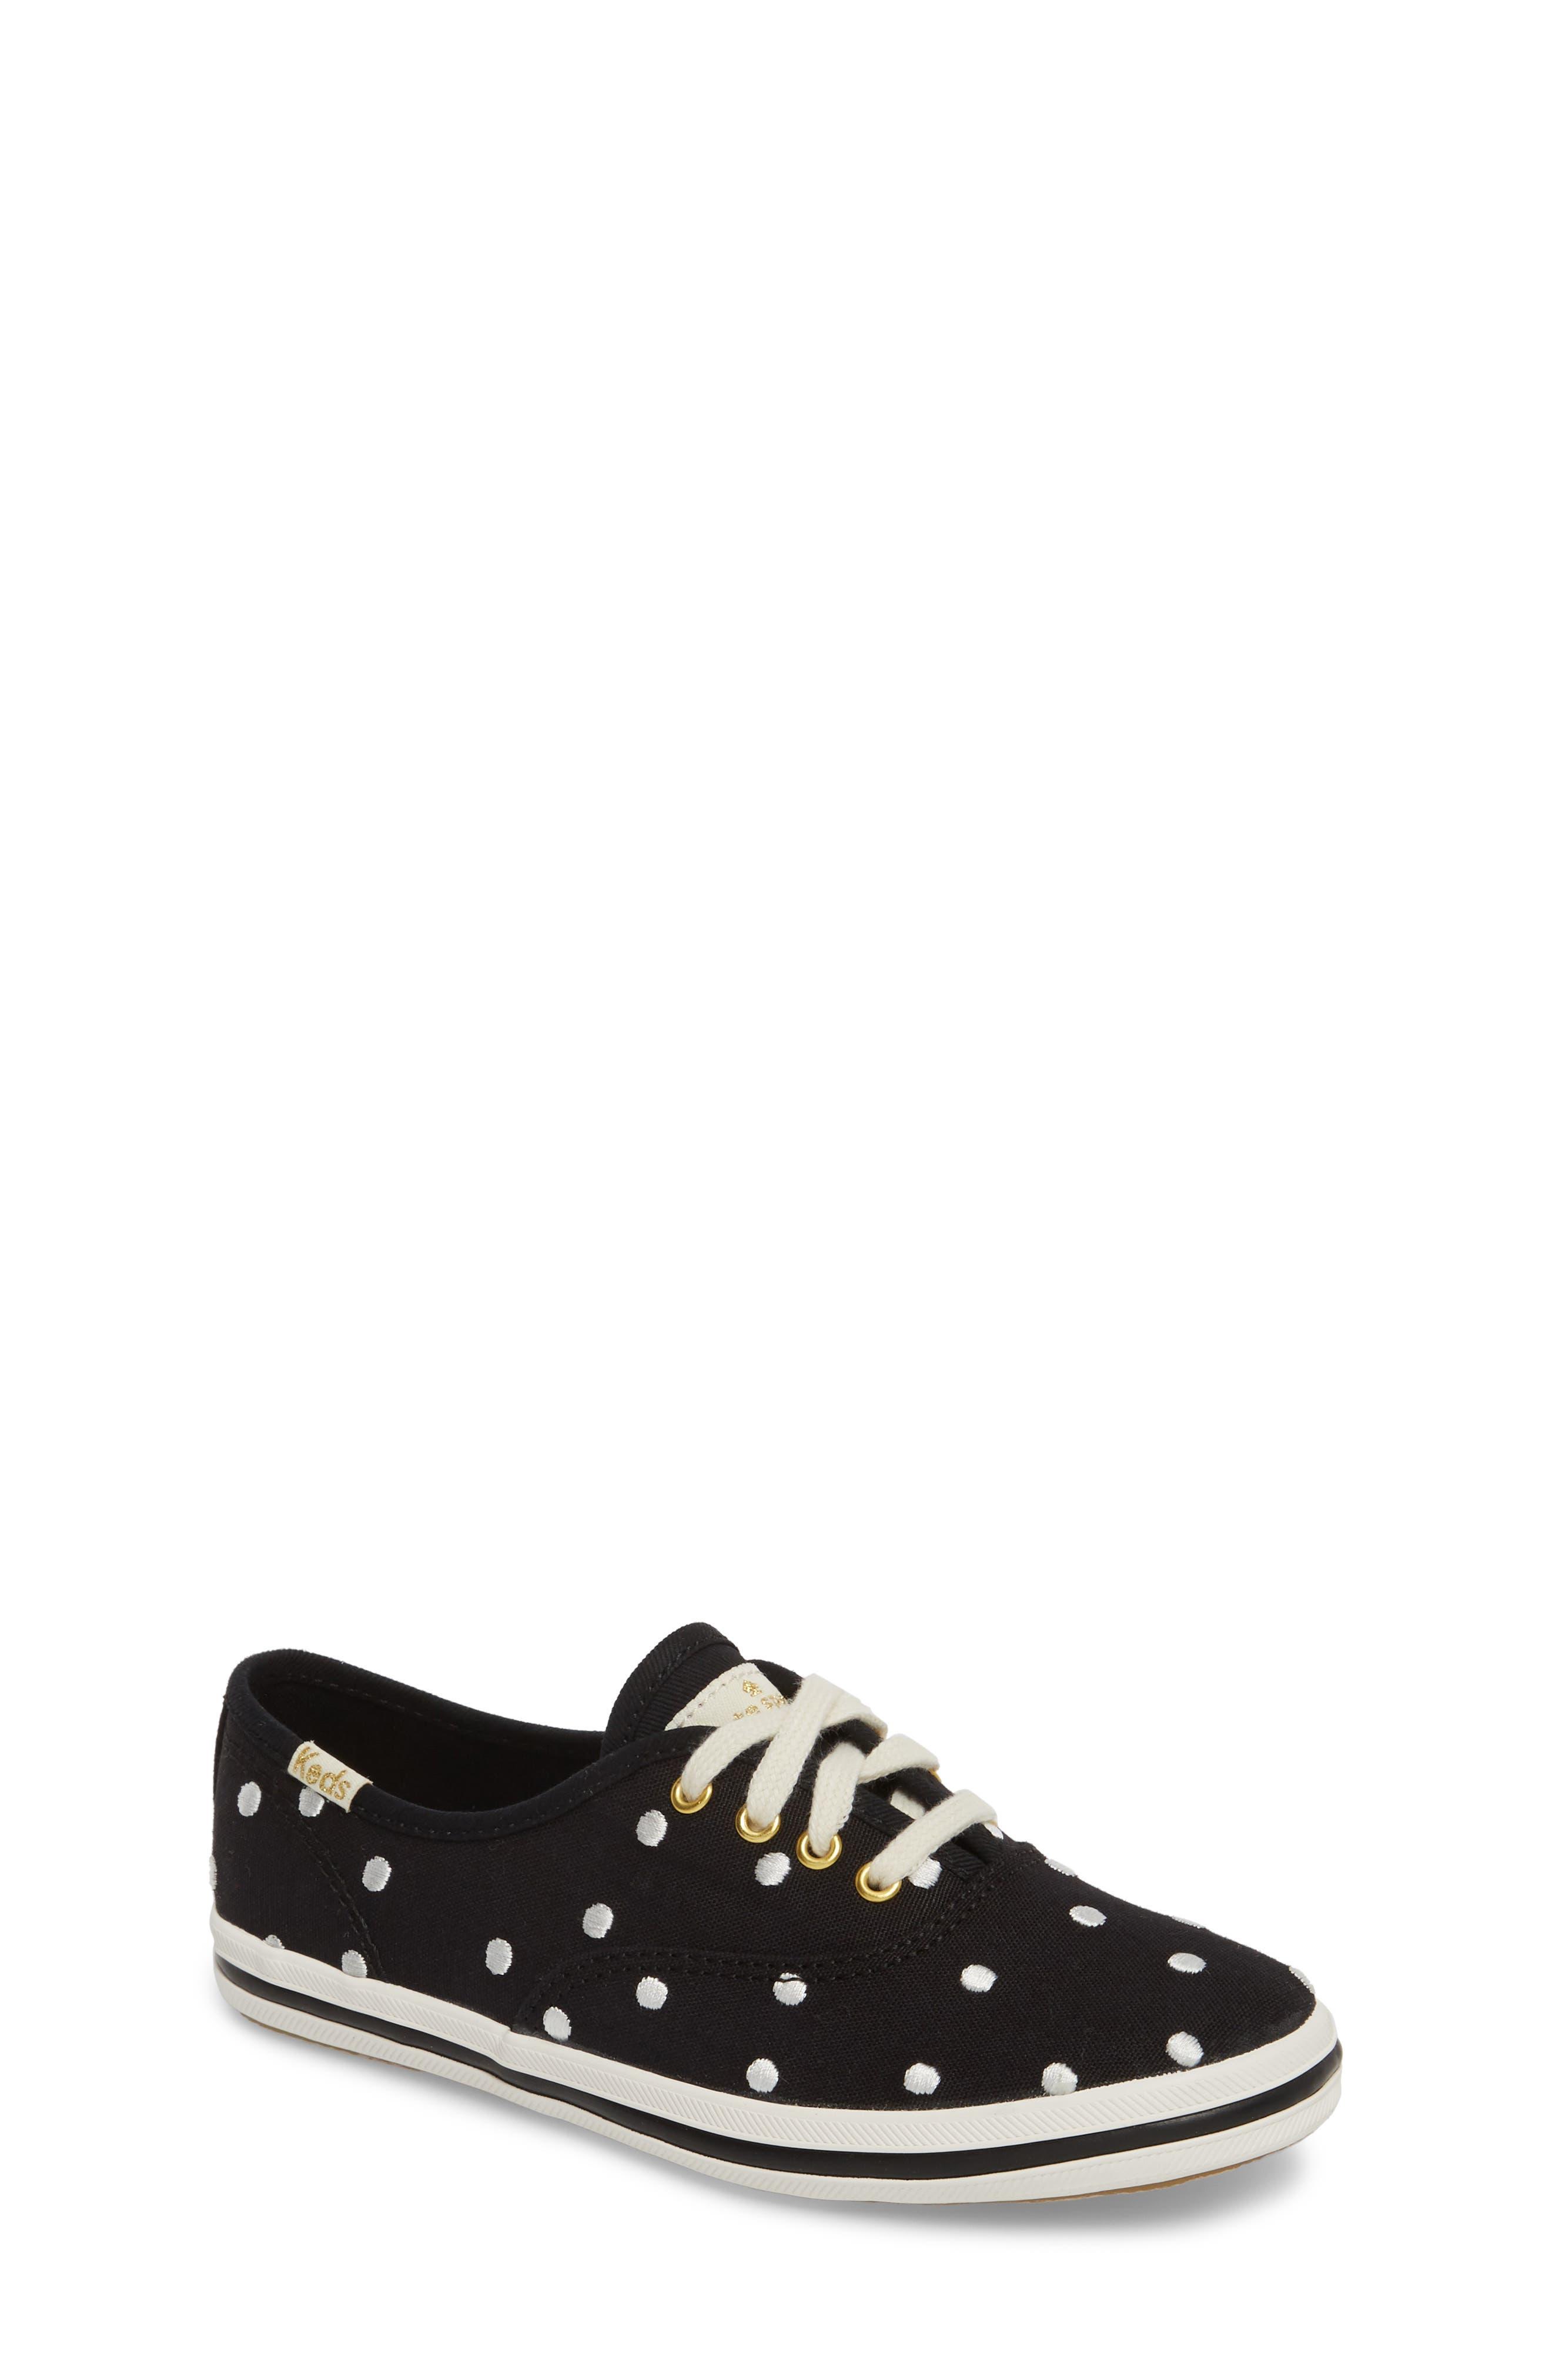 x kate spade new york champion polka dot lace-up shoe,                         Main,                         color, BLACK DANCING DOT